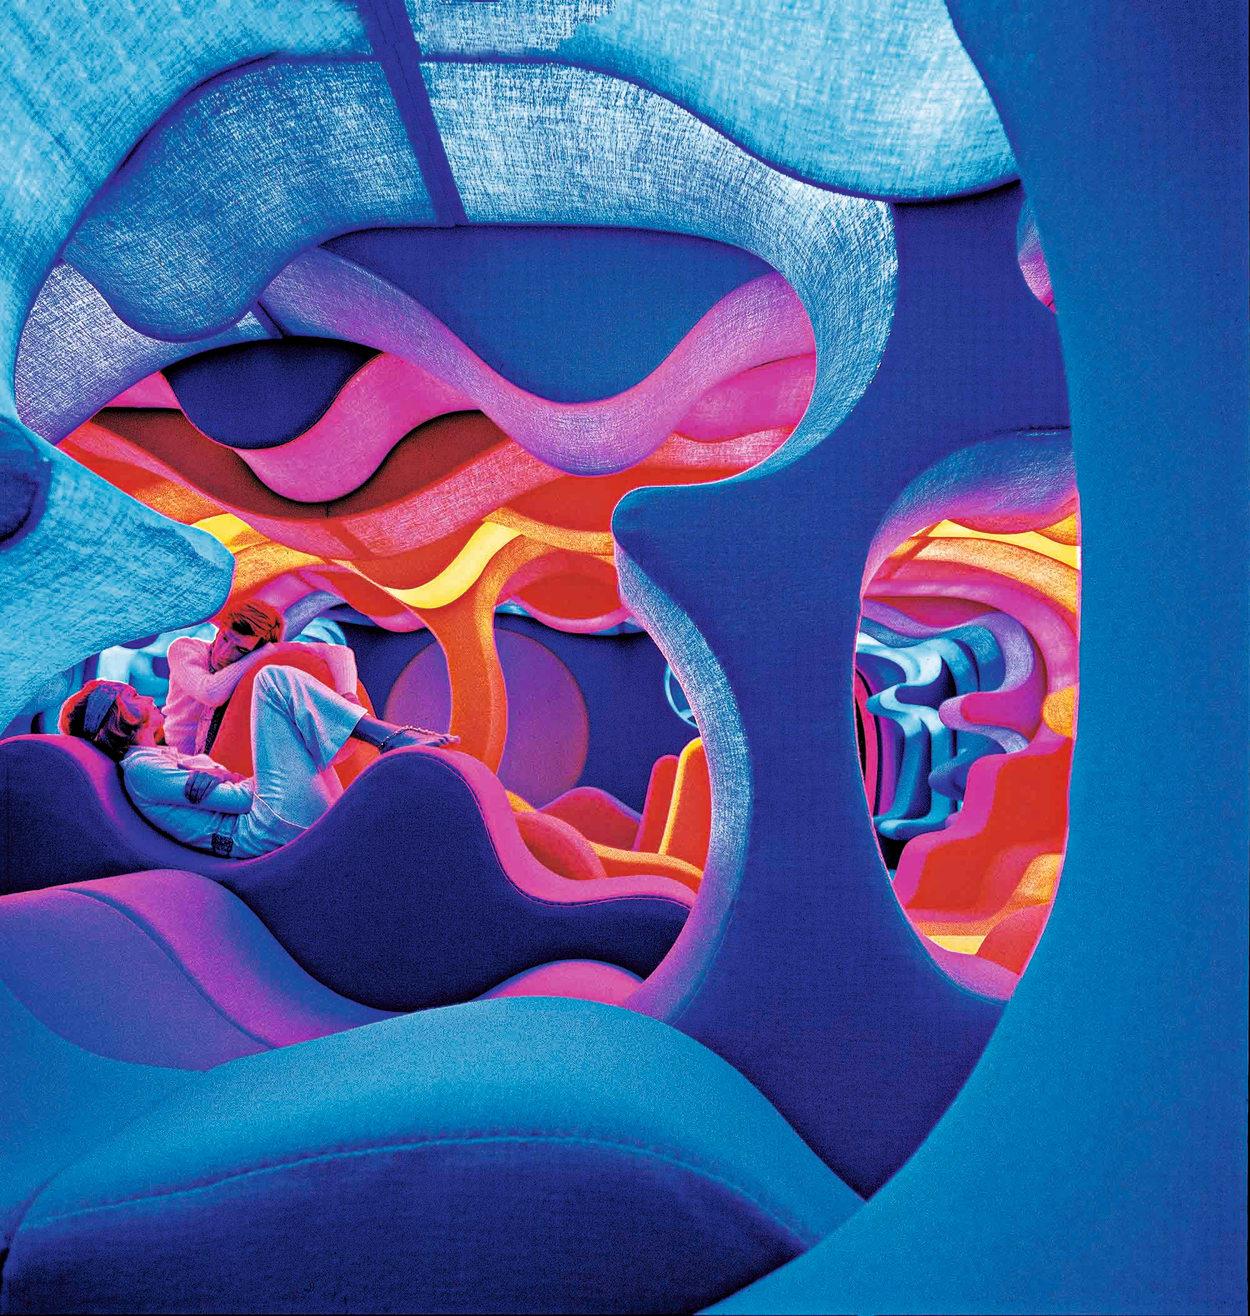 """Fantasy Landscape"", Vitra, Verner Panton"